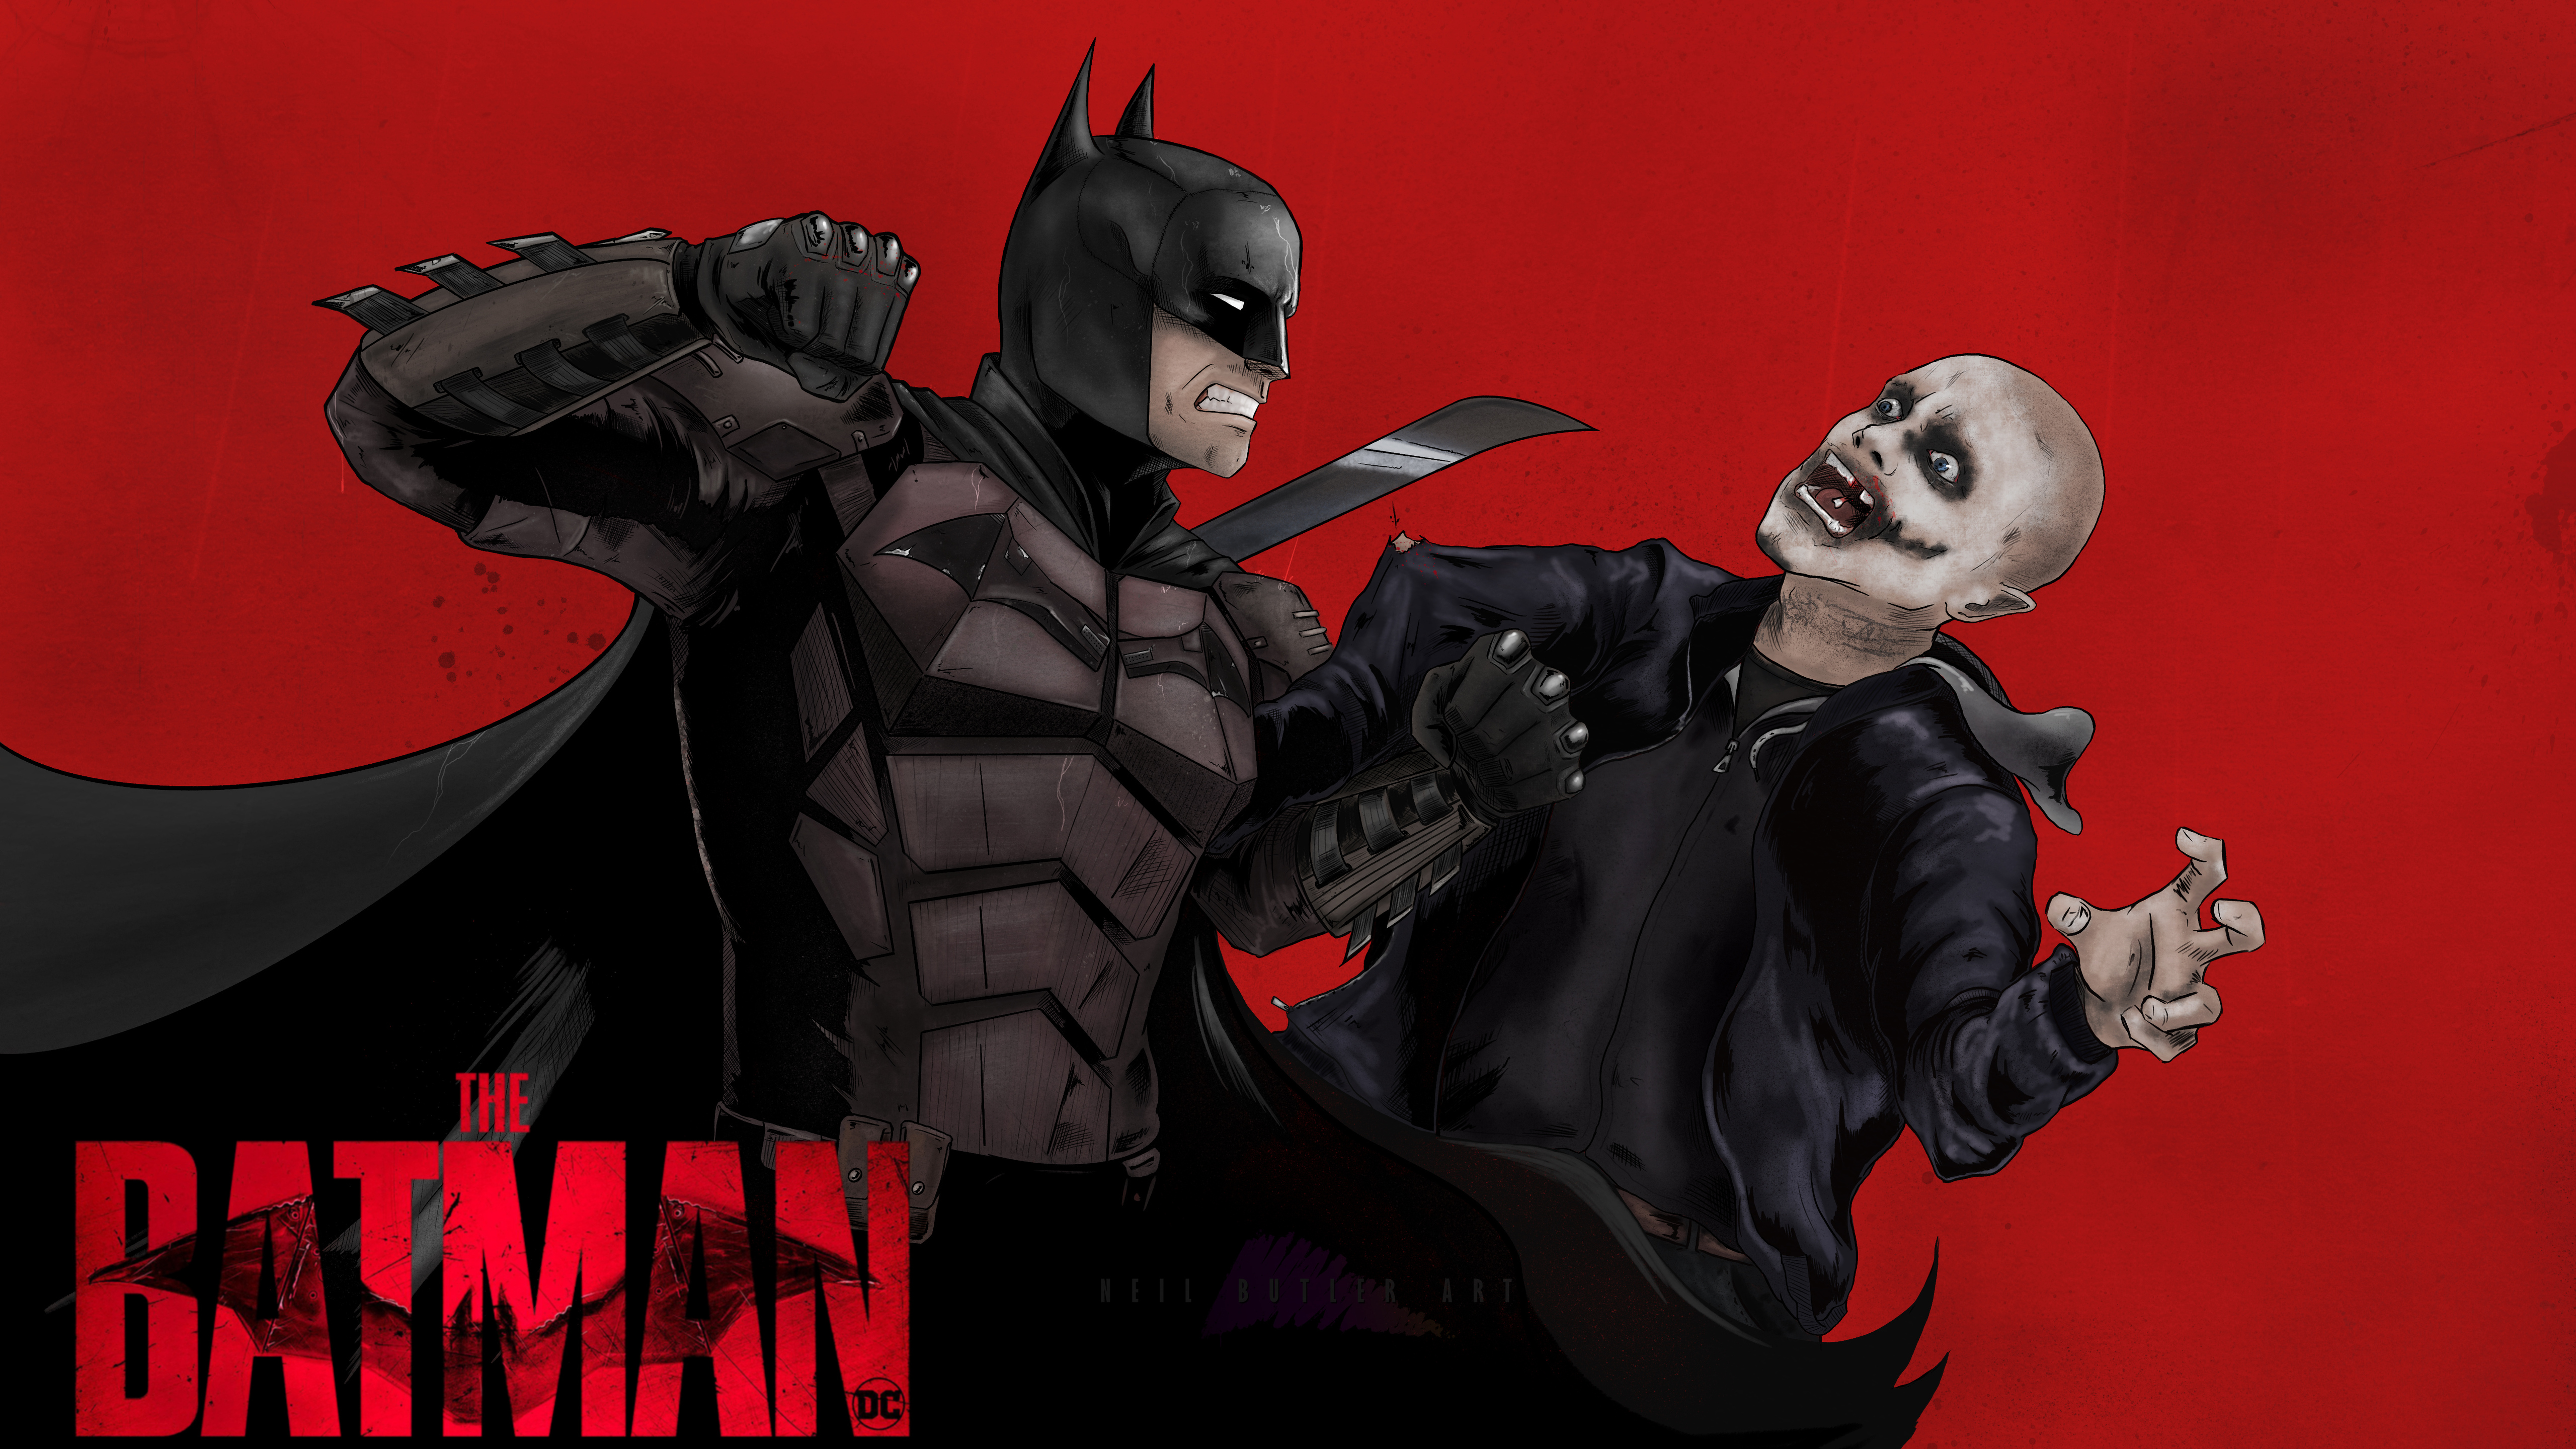 the-batman-2021-5k-jo.jpg